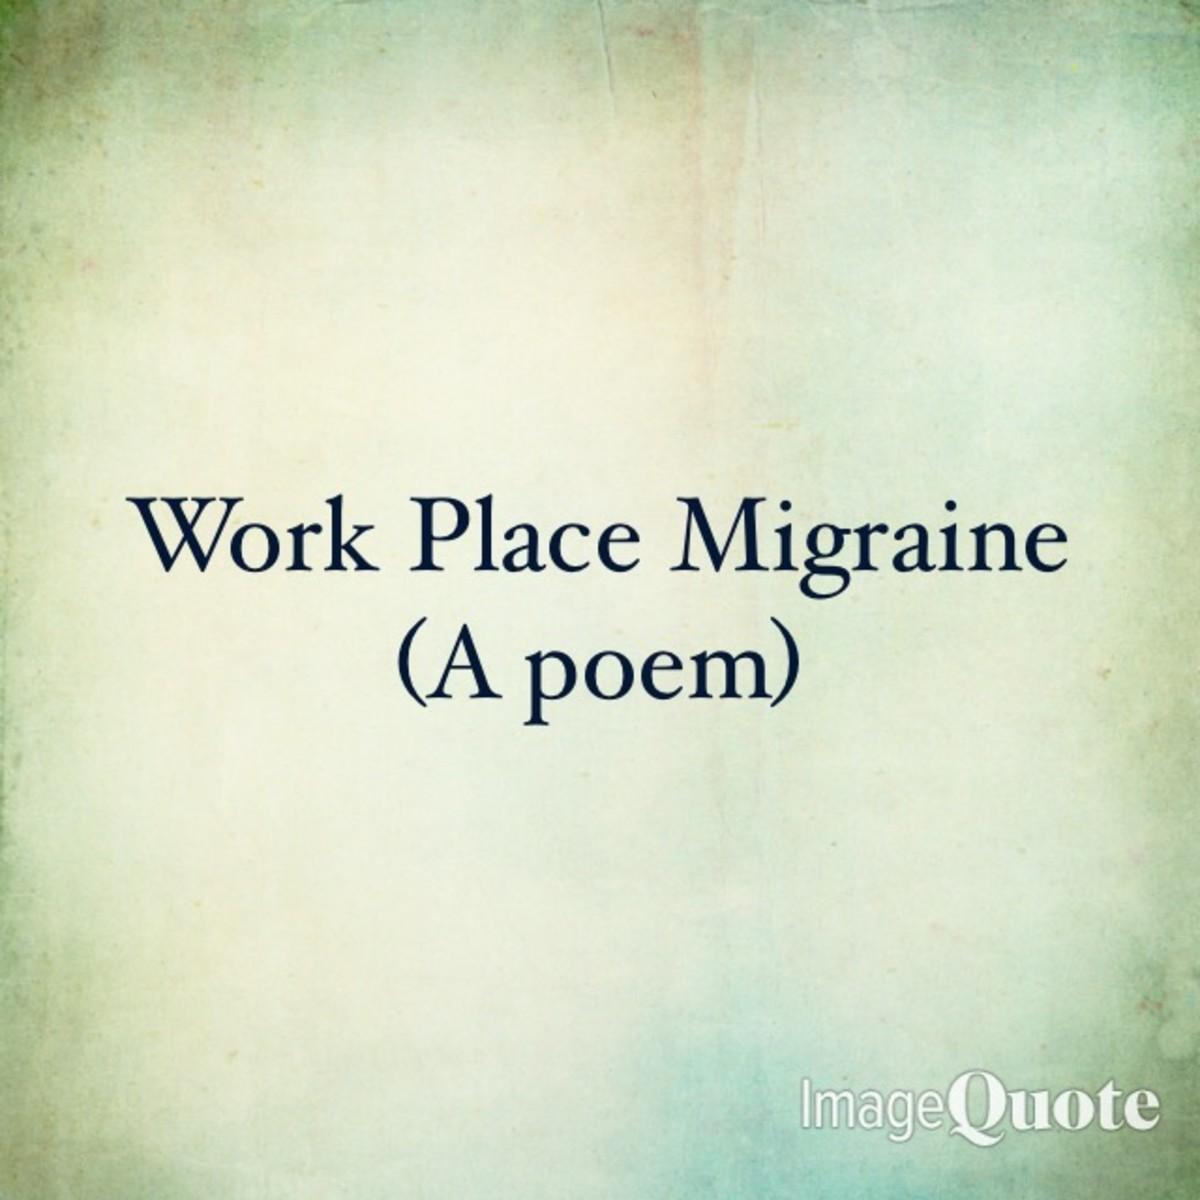 Work Place Migraine